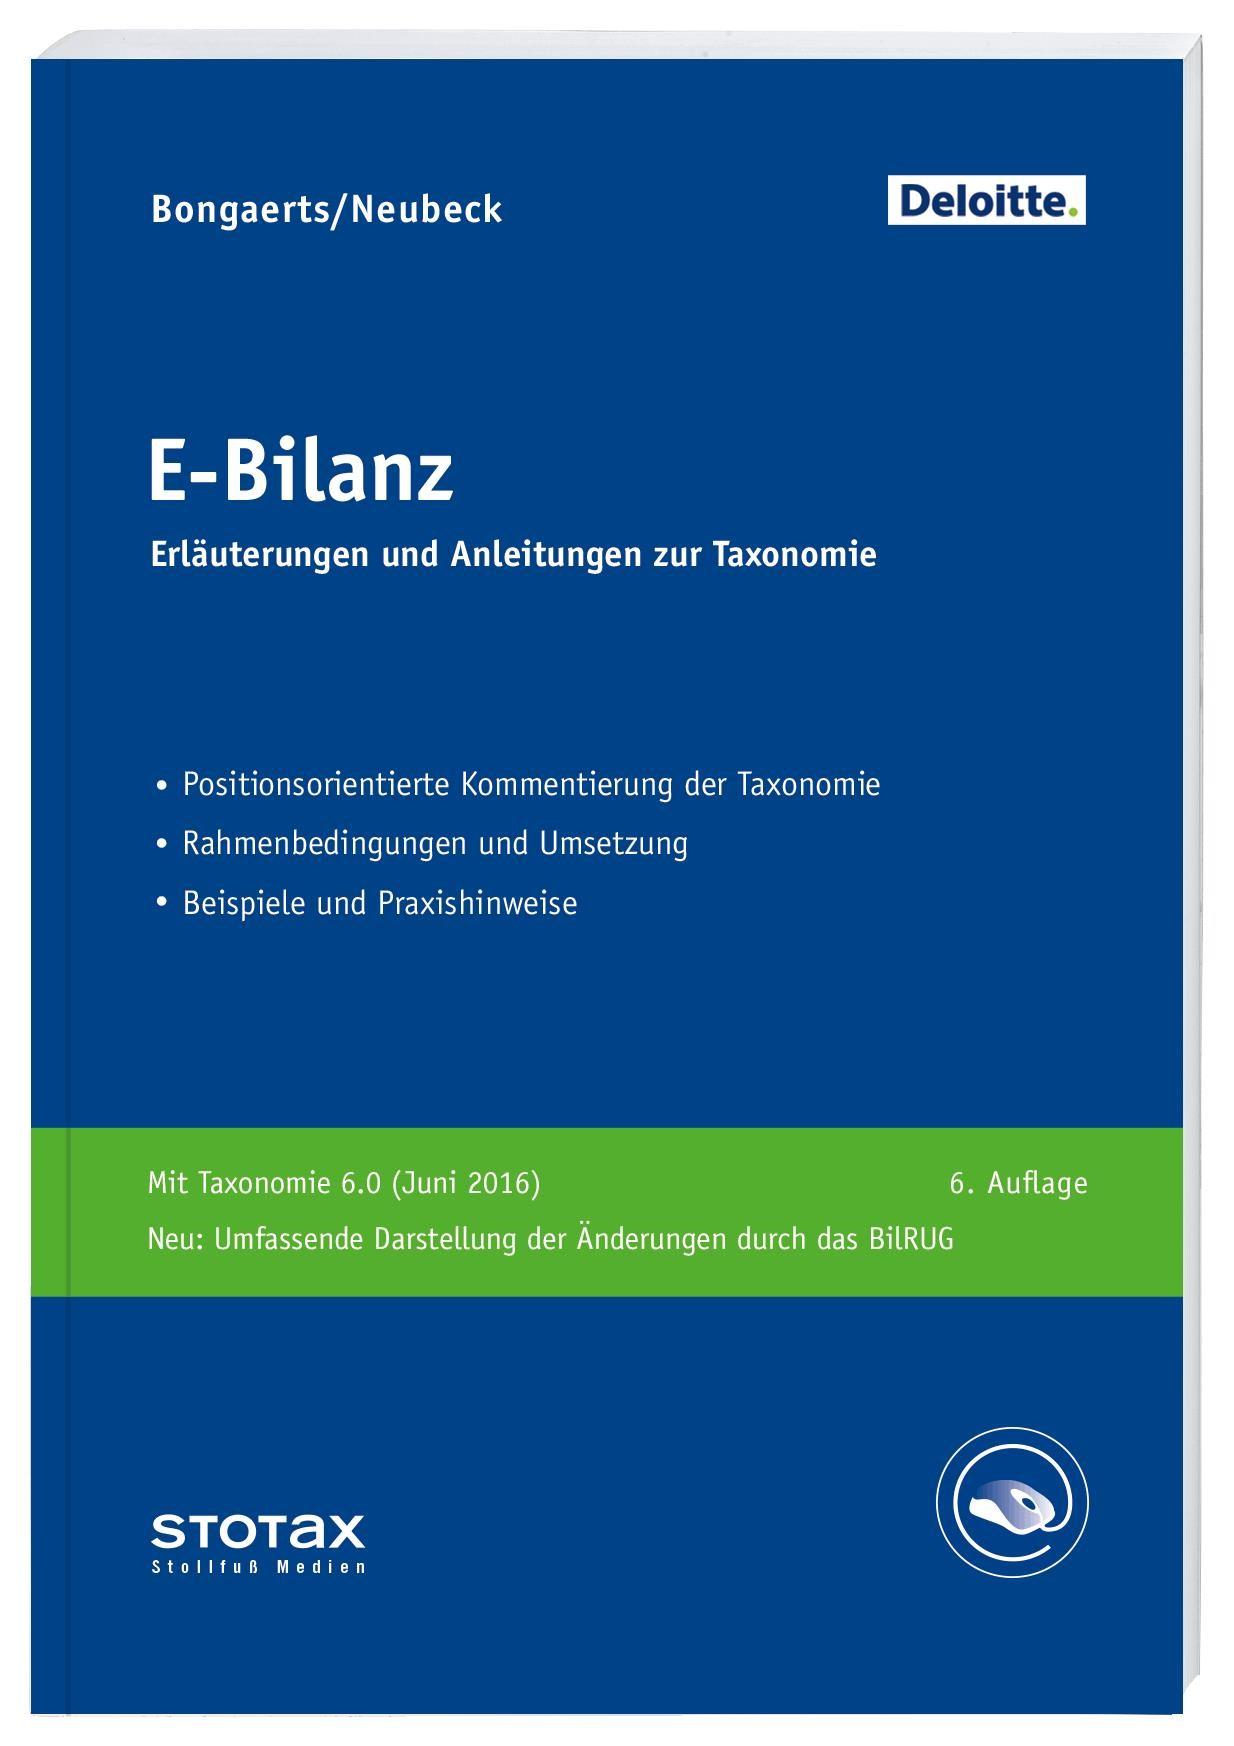 Abbildung von Bongaertz / Neubeck | E-Bilanz • Online